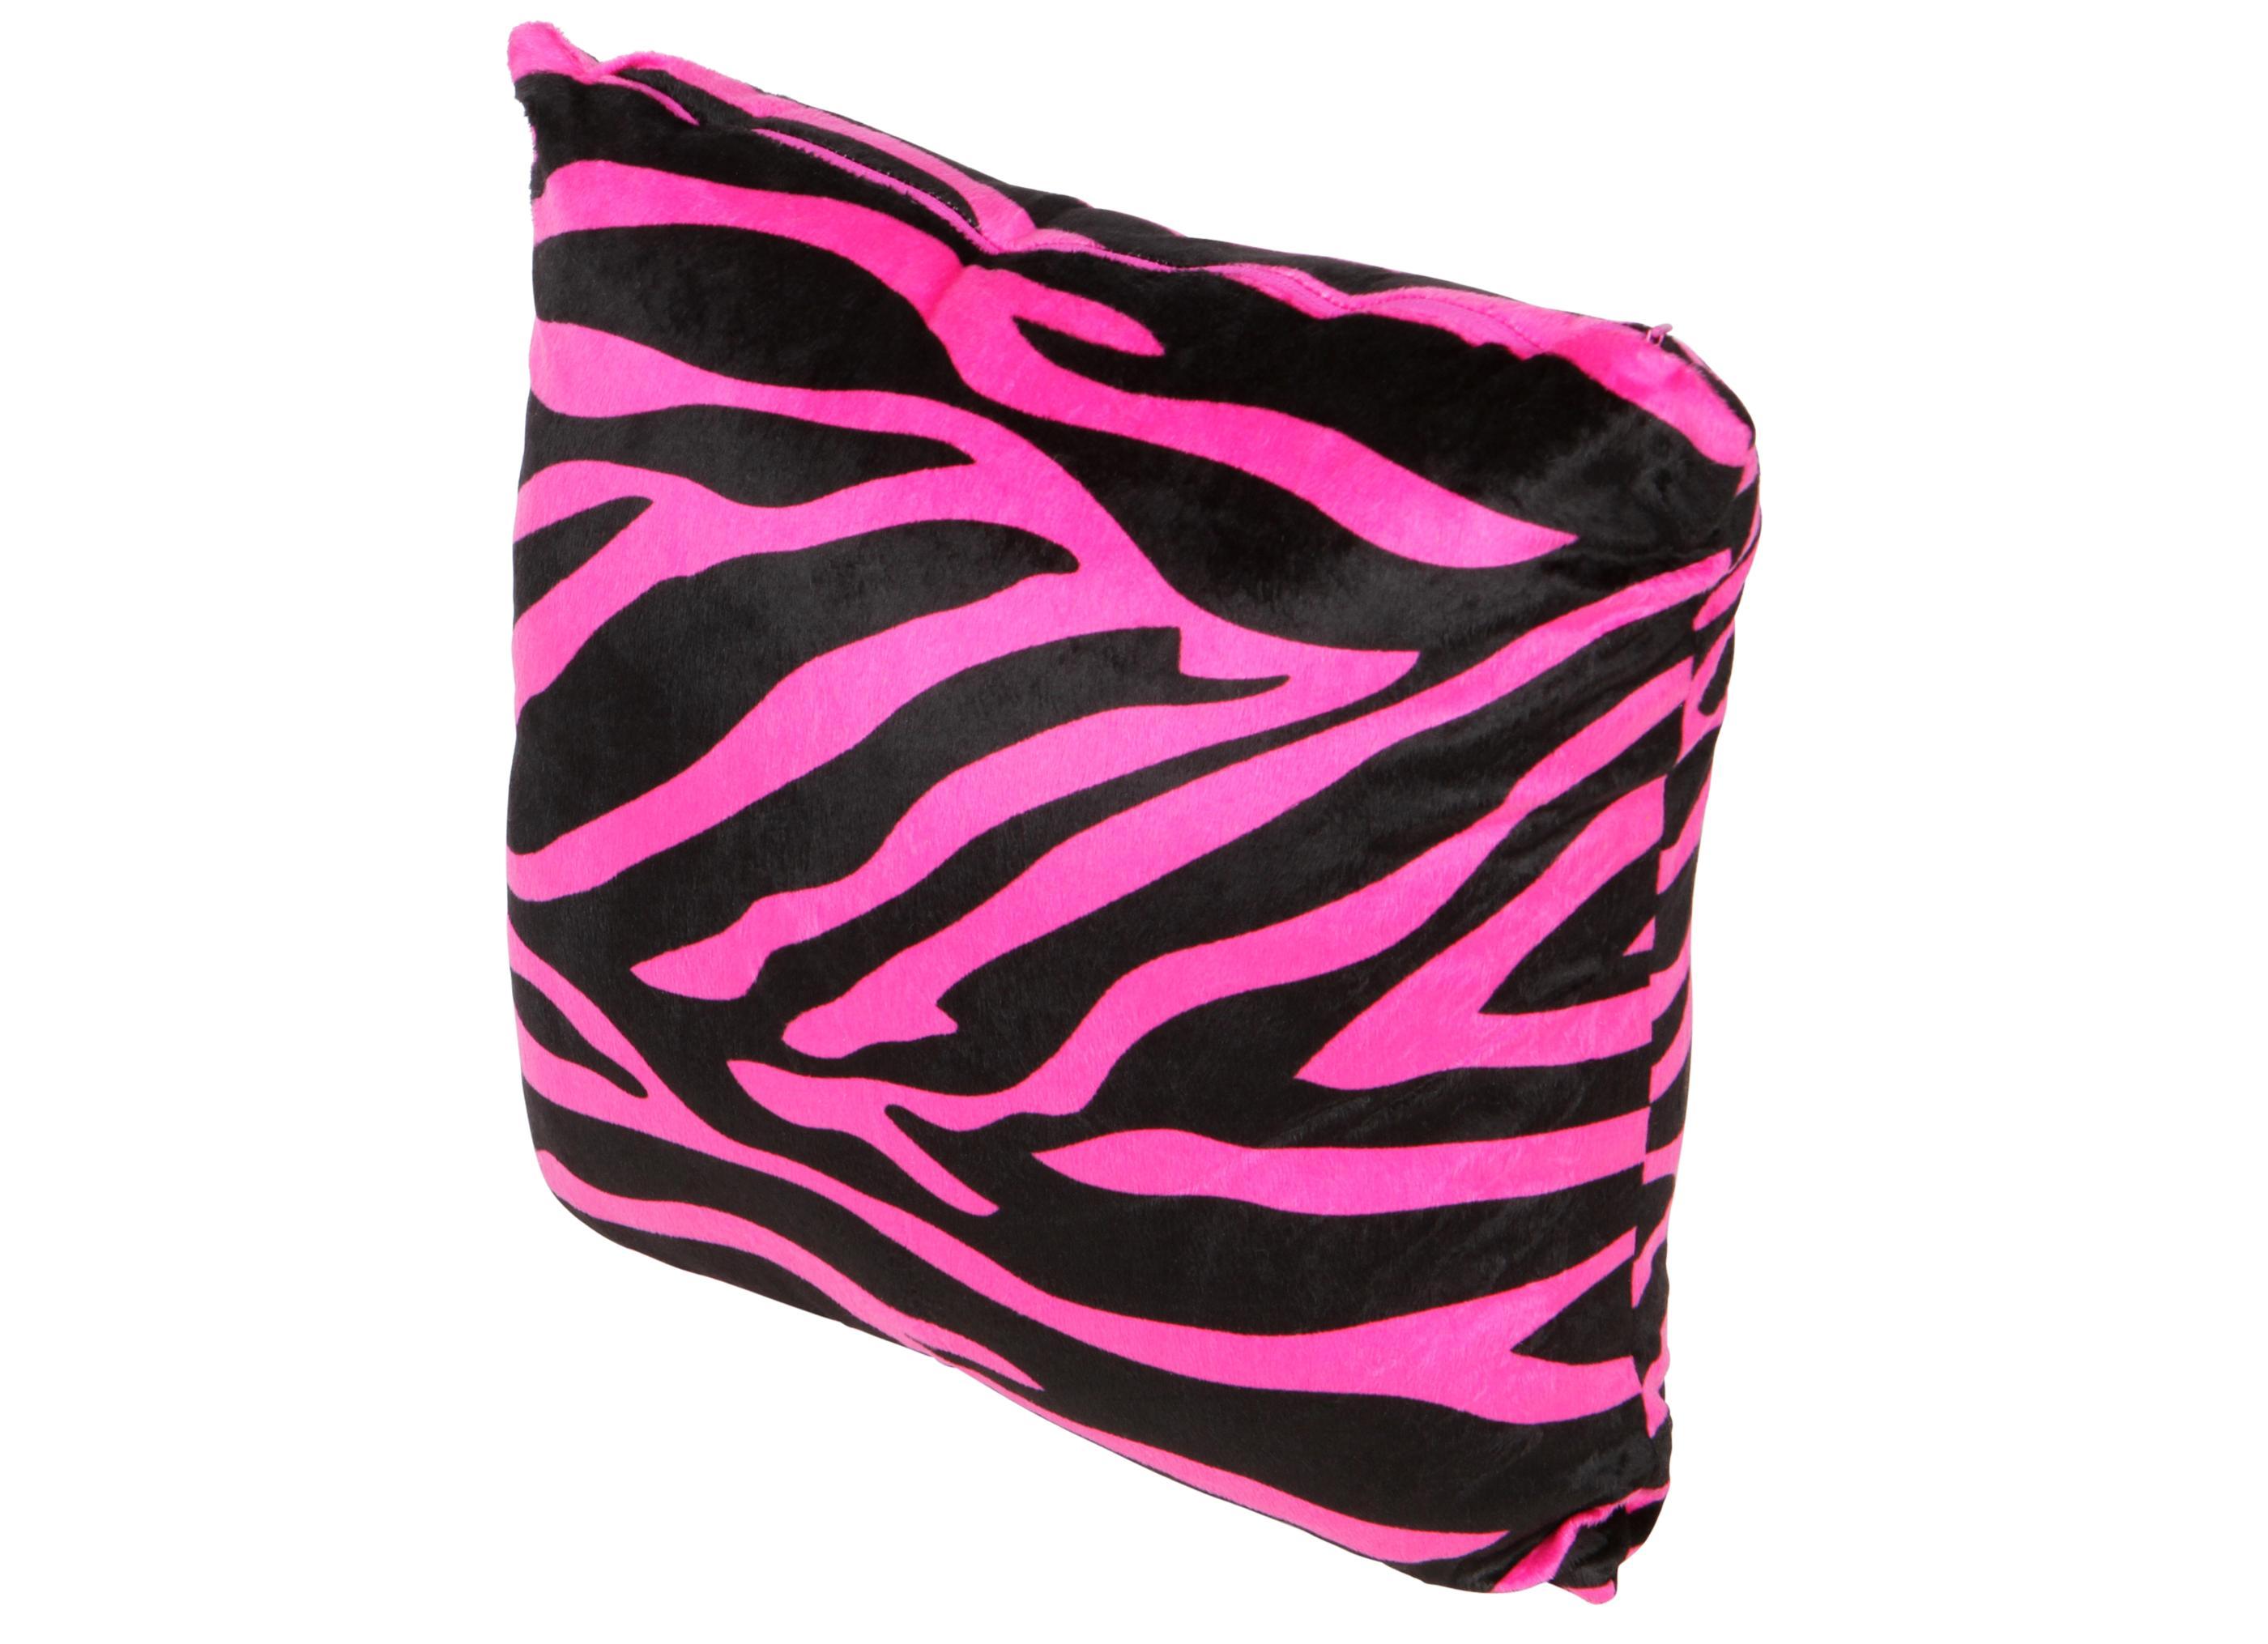 deko kissen zebra dekokissen. Black Bedroom Furniture Sets. Home Design Ideas